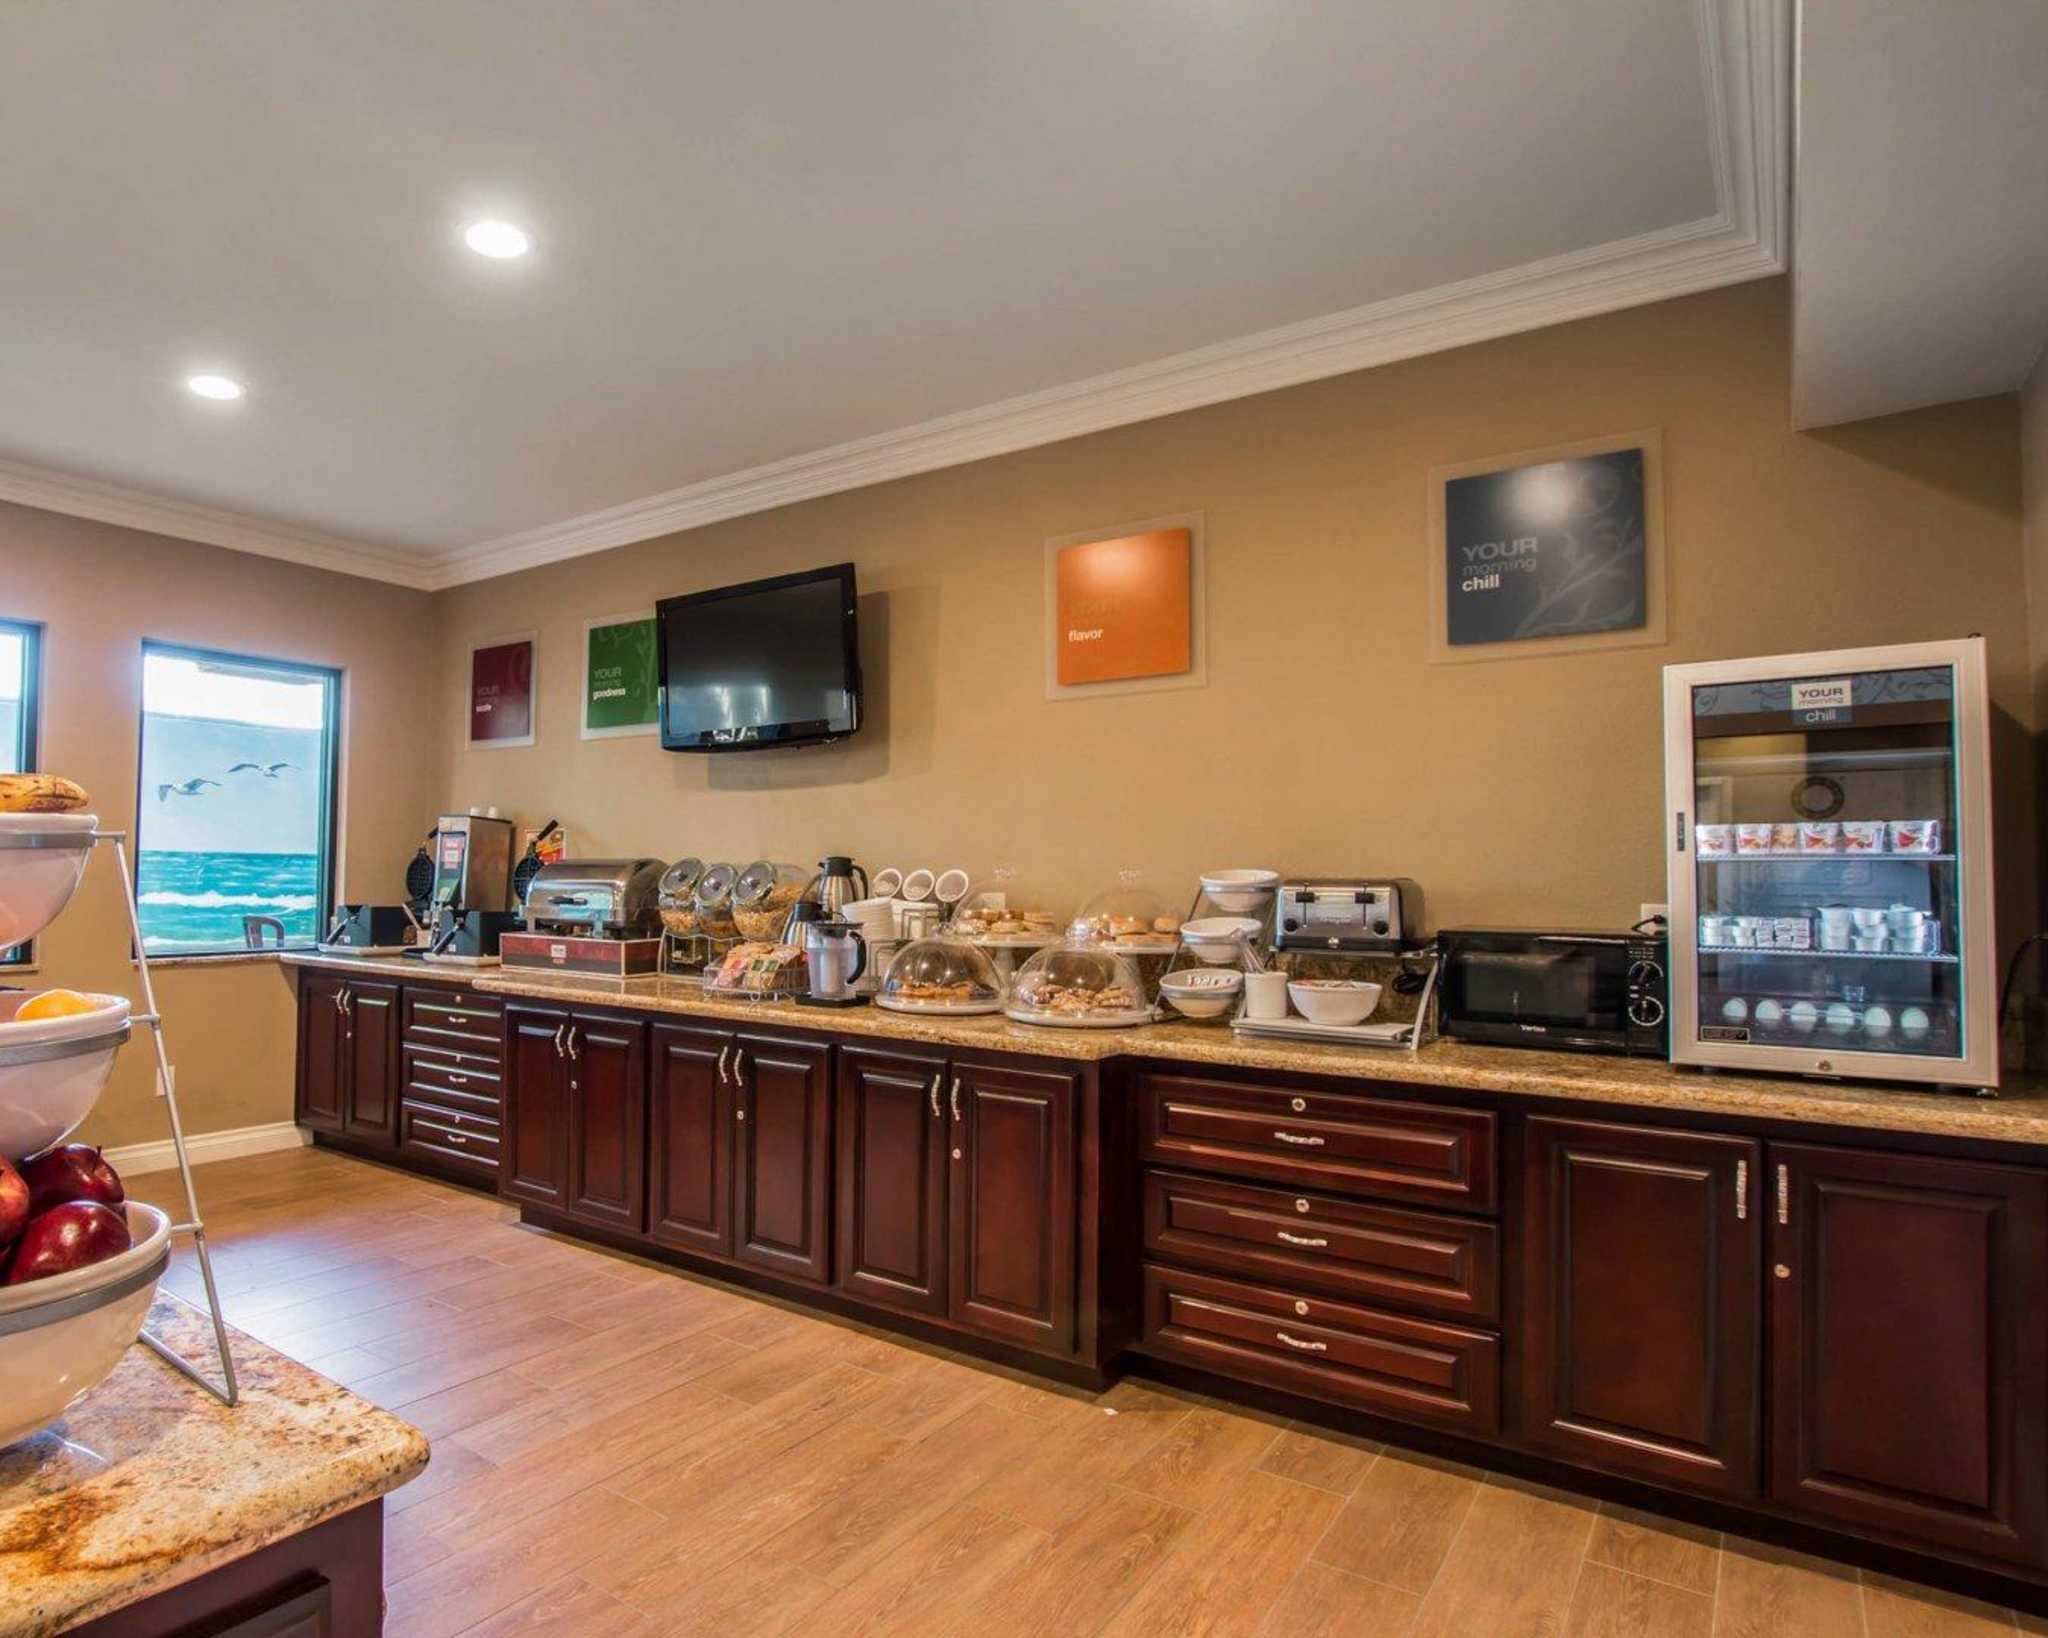 Comfort Suites Huntington Beach image 15